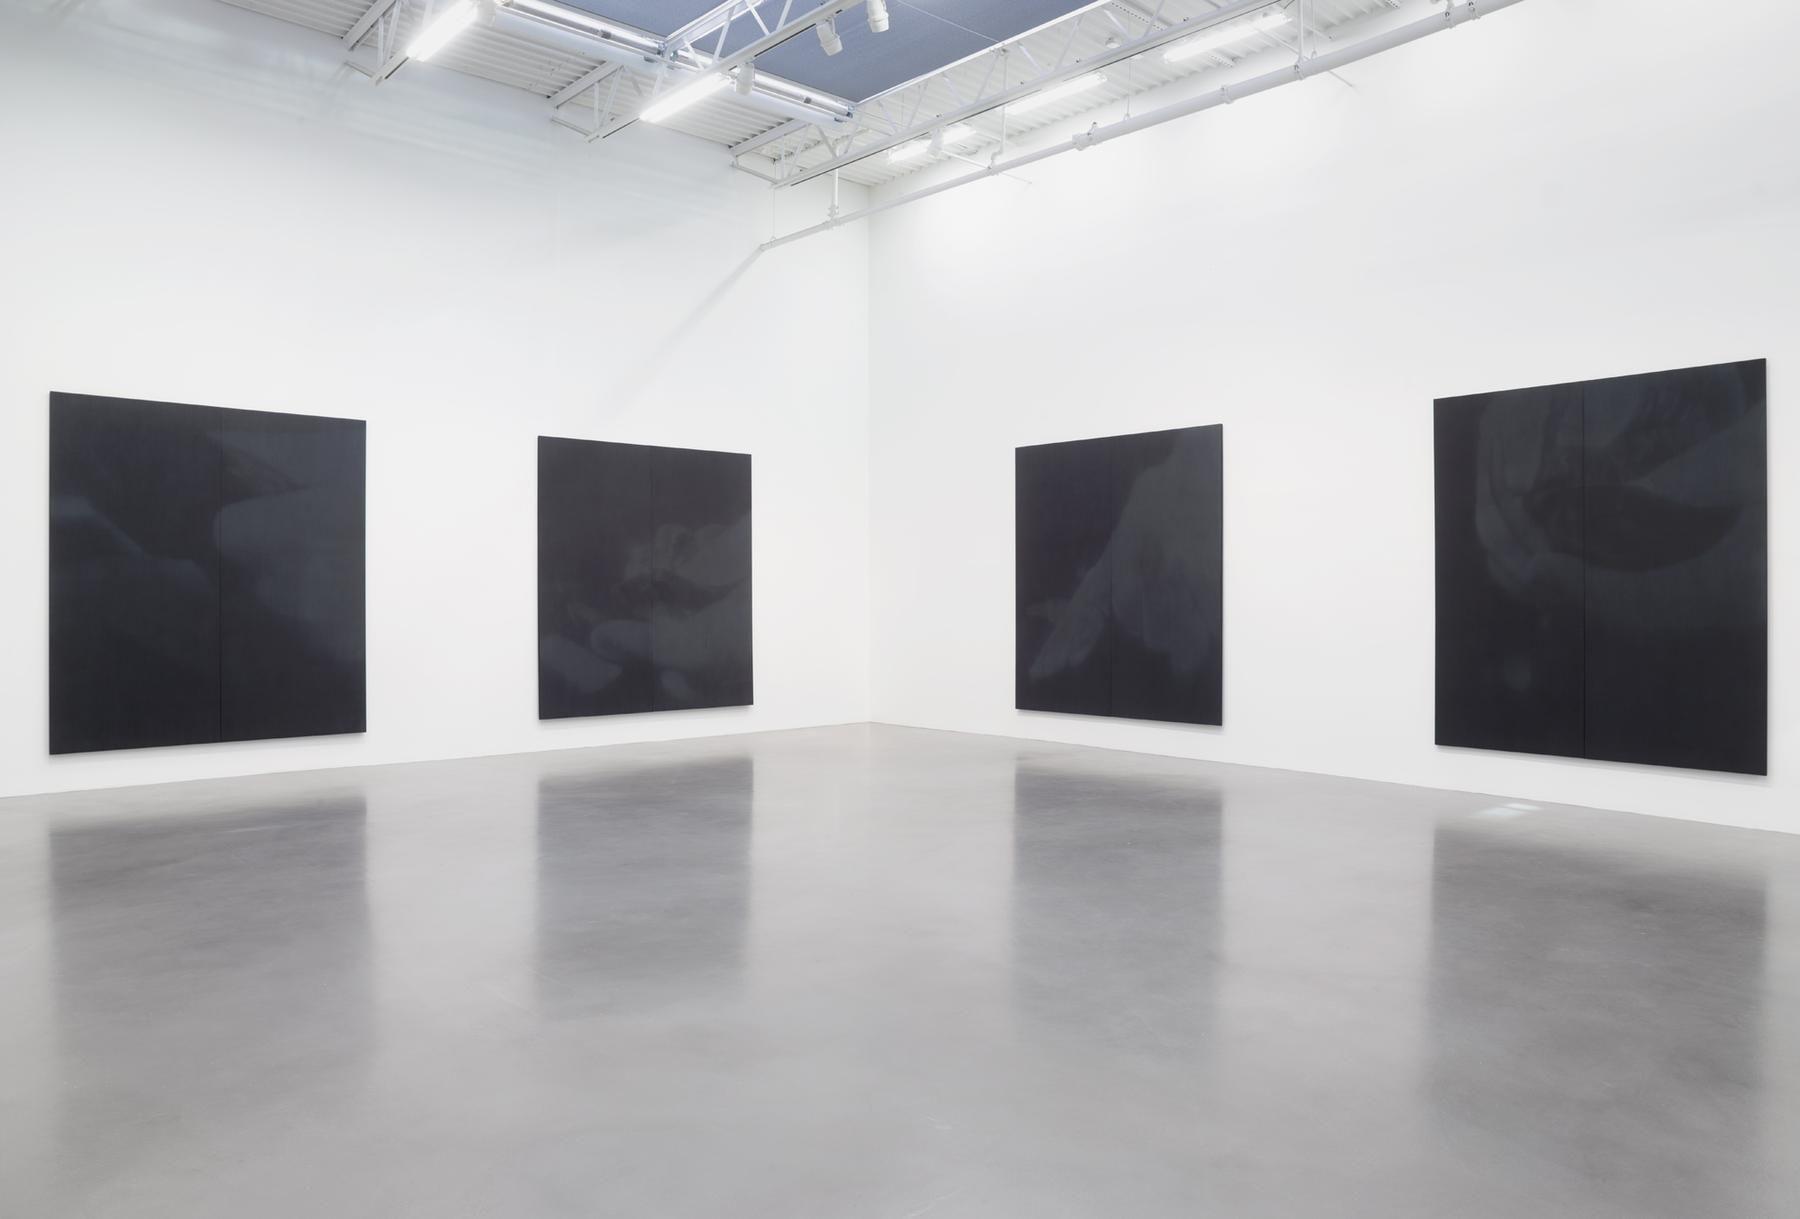 Troy Brauntuch Installation view 10